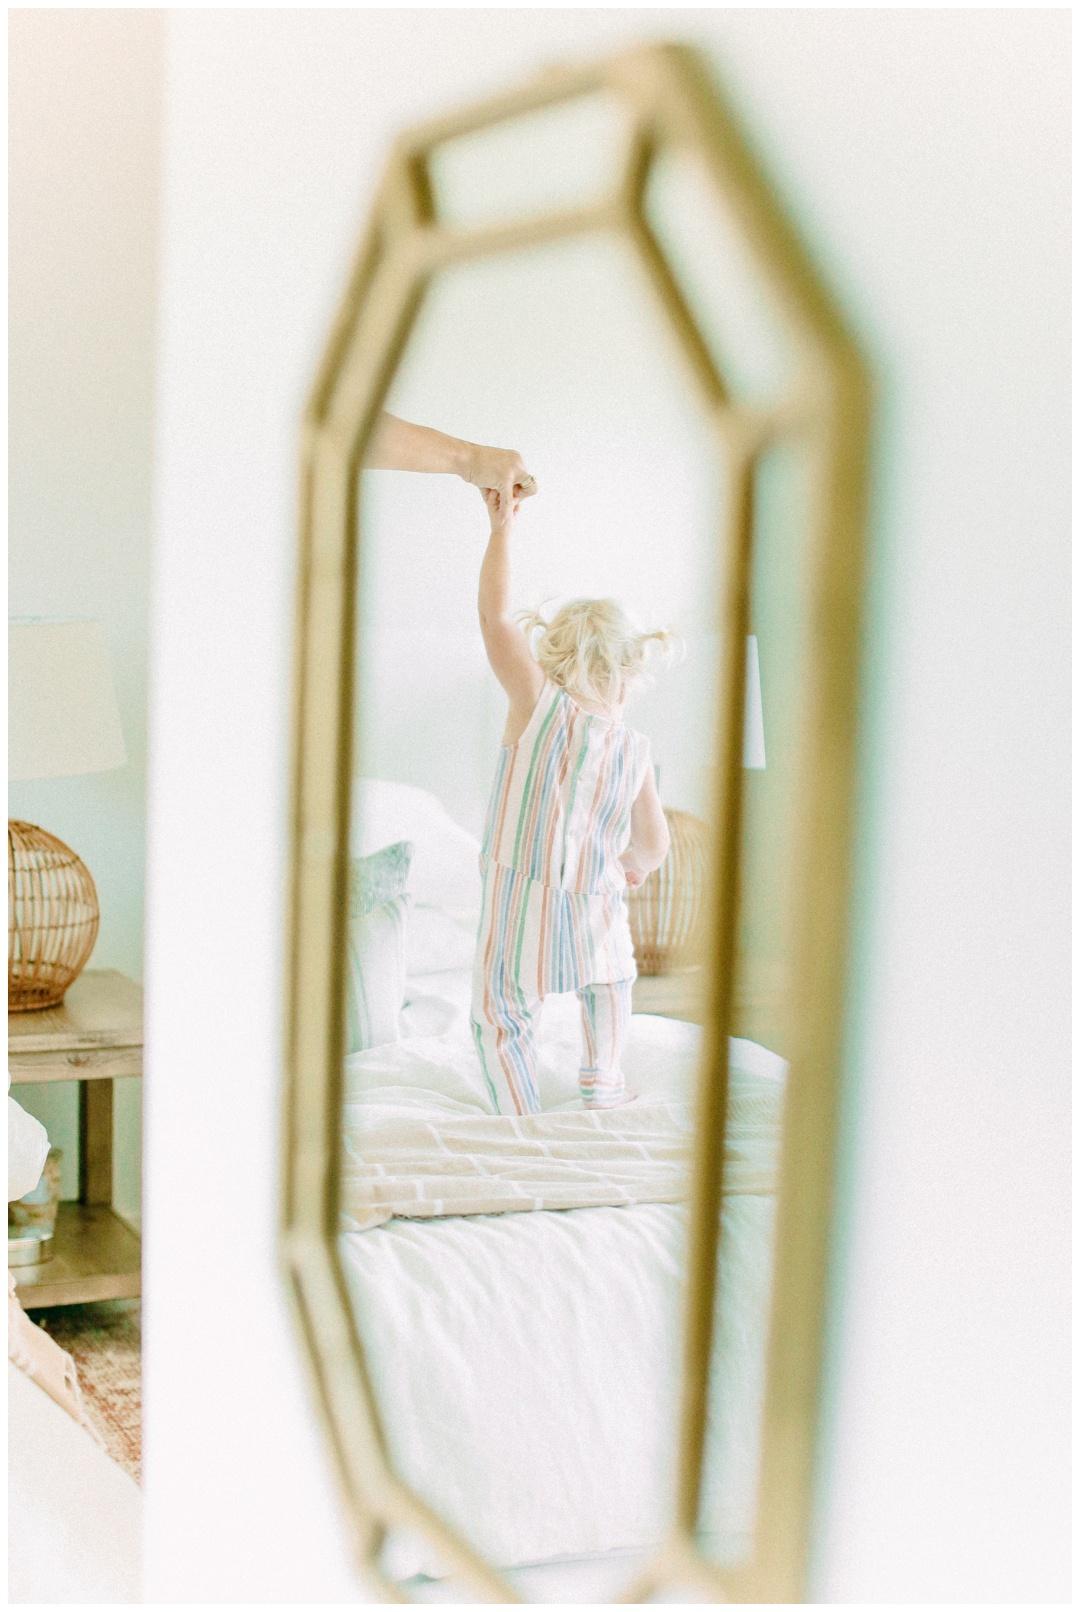 Kristin_Dinsmore_Family_Newport_Beach_Family_Photographer_in_home_lifestyle_session_Cori_kleckner_photography_Orange_county_in_home_Family_photos_Newport_Beach_Family_photos__1764.jpg